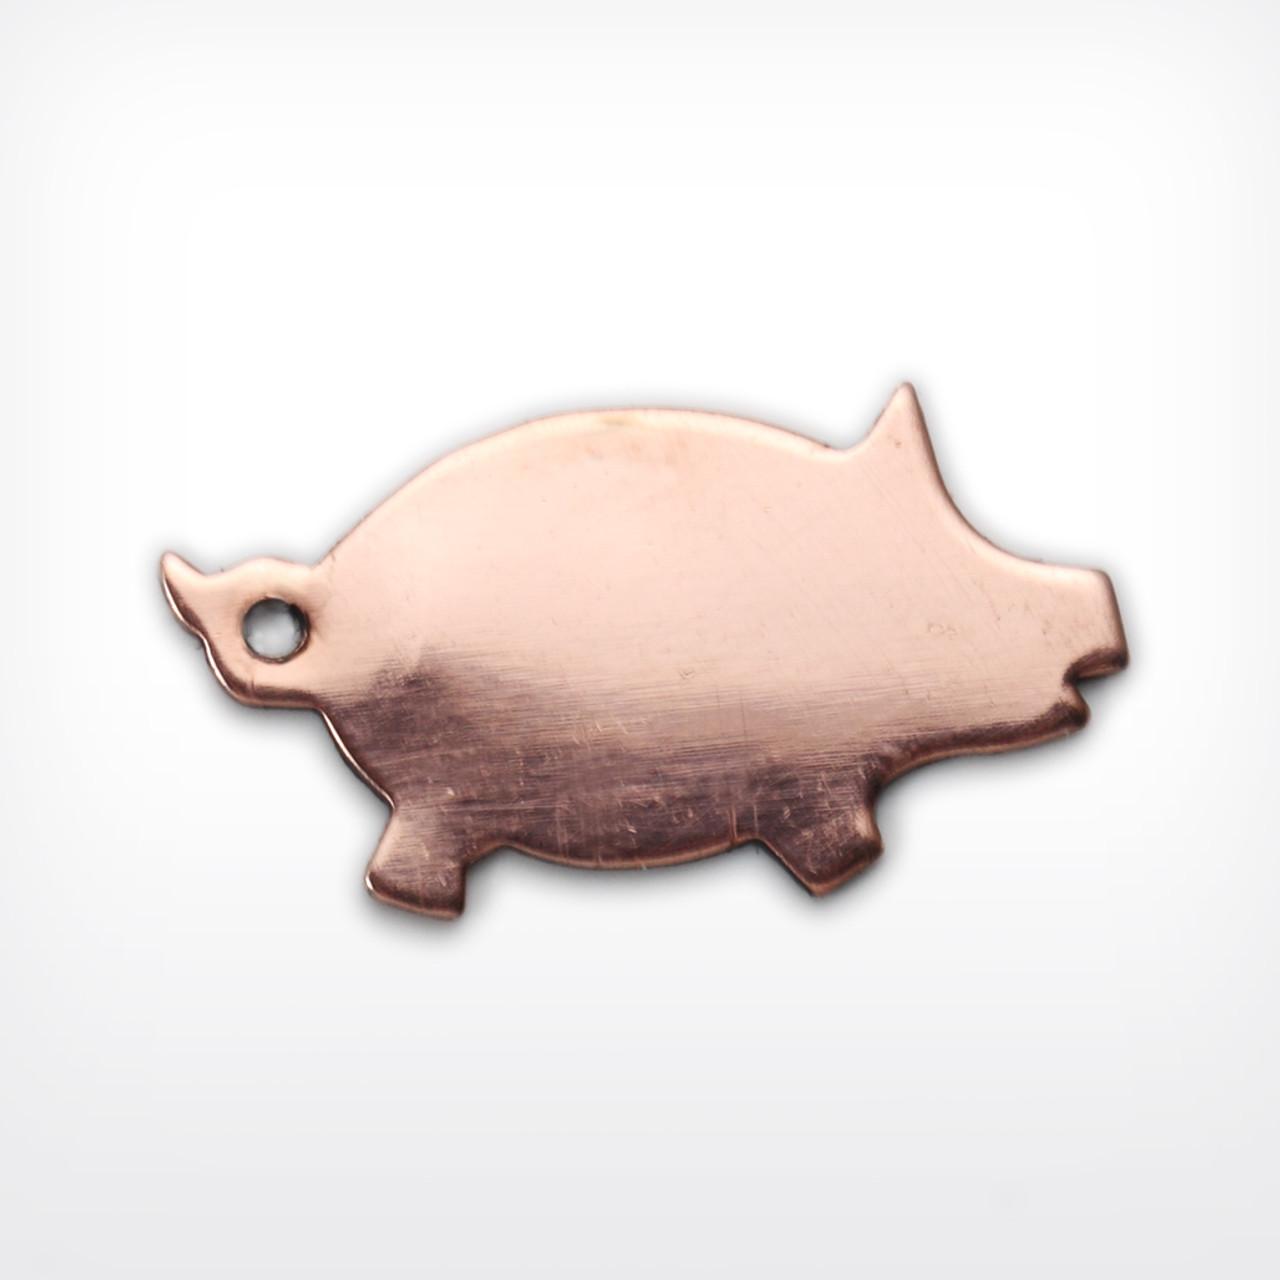 Copper Blank Pig Stamped Shape for Enamelling & Other Crafts